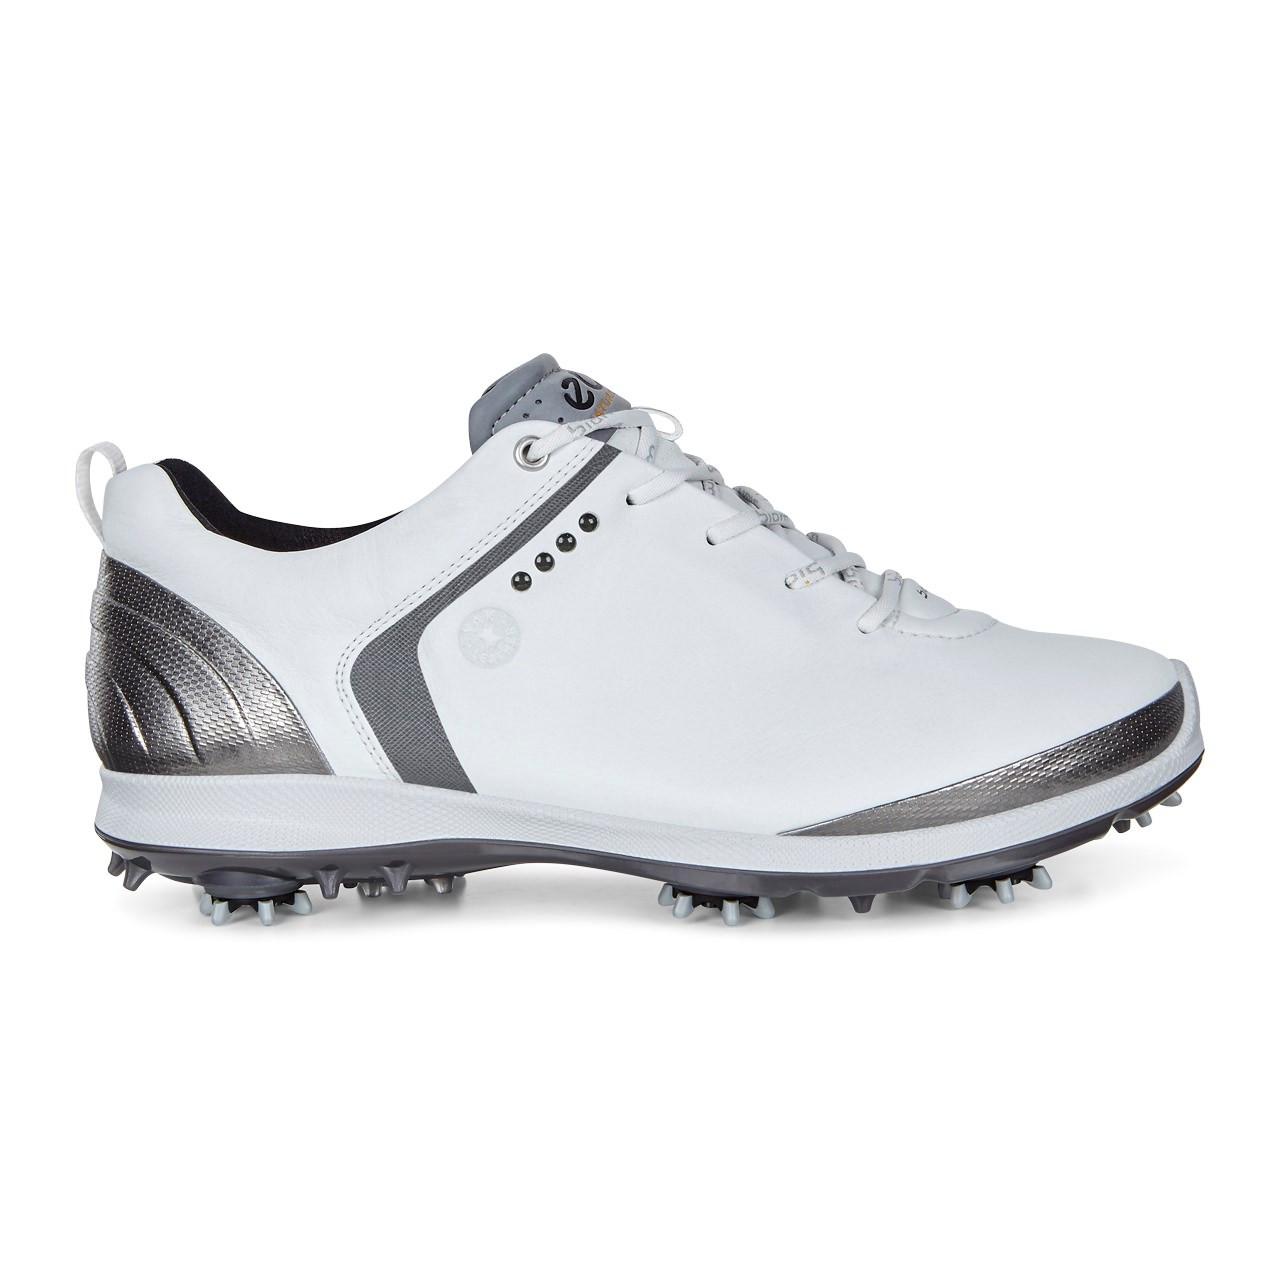 a516f3417cf Mens Biom G2 Golf Shoes Goretex White/Dark Shadow - London Pro Golf